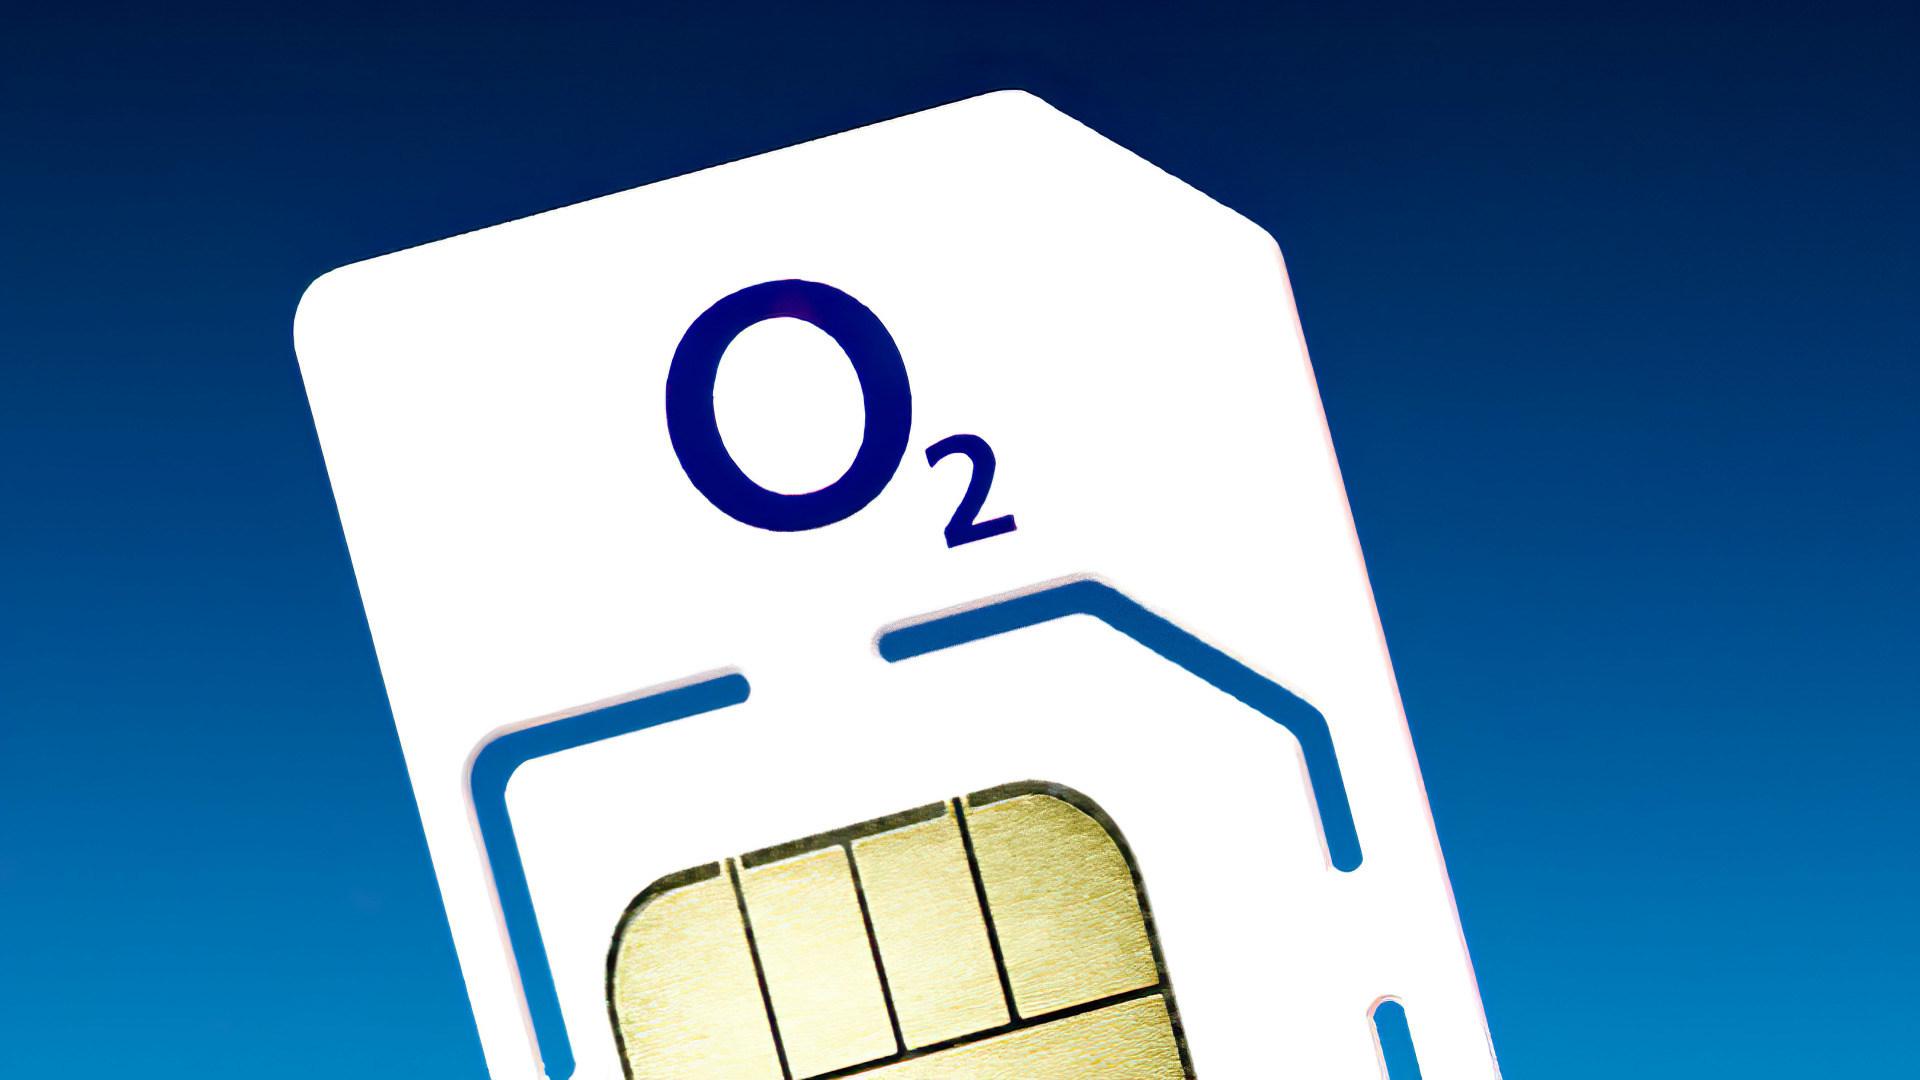 Tarif, Provider, O2, Telefonica, Sim, O2 Free